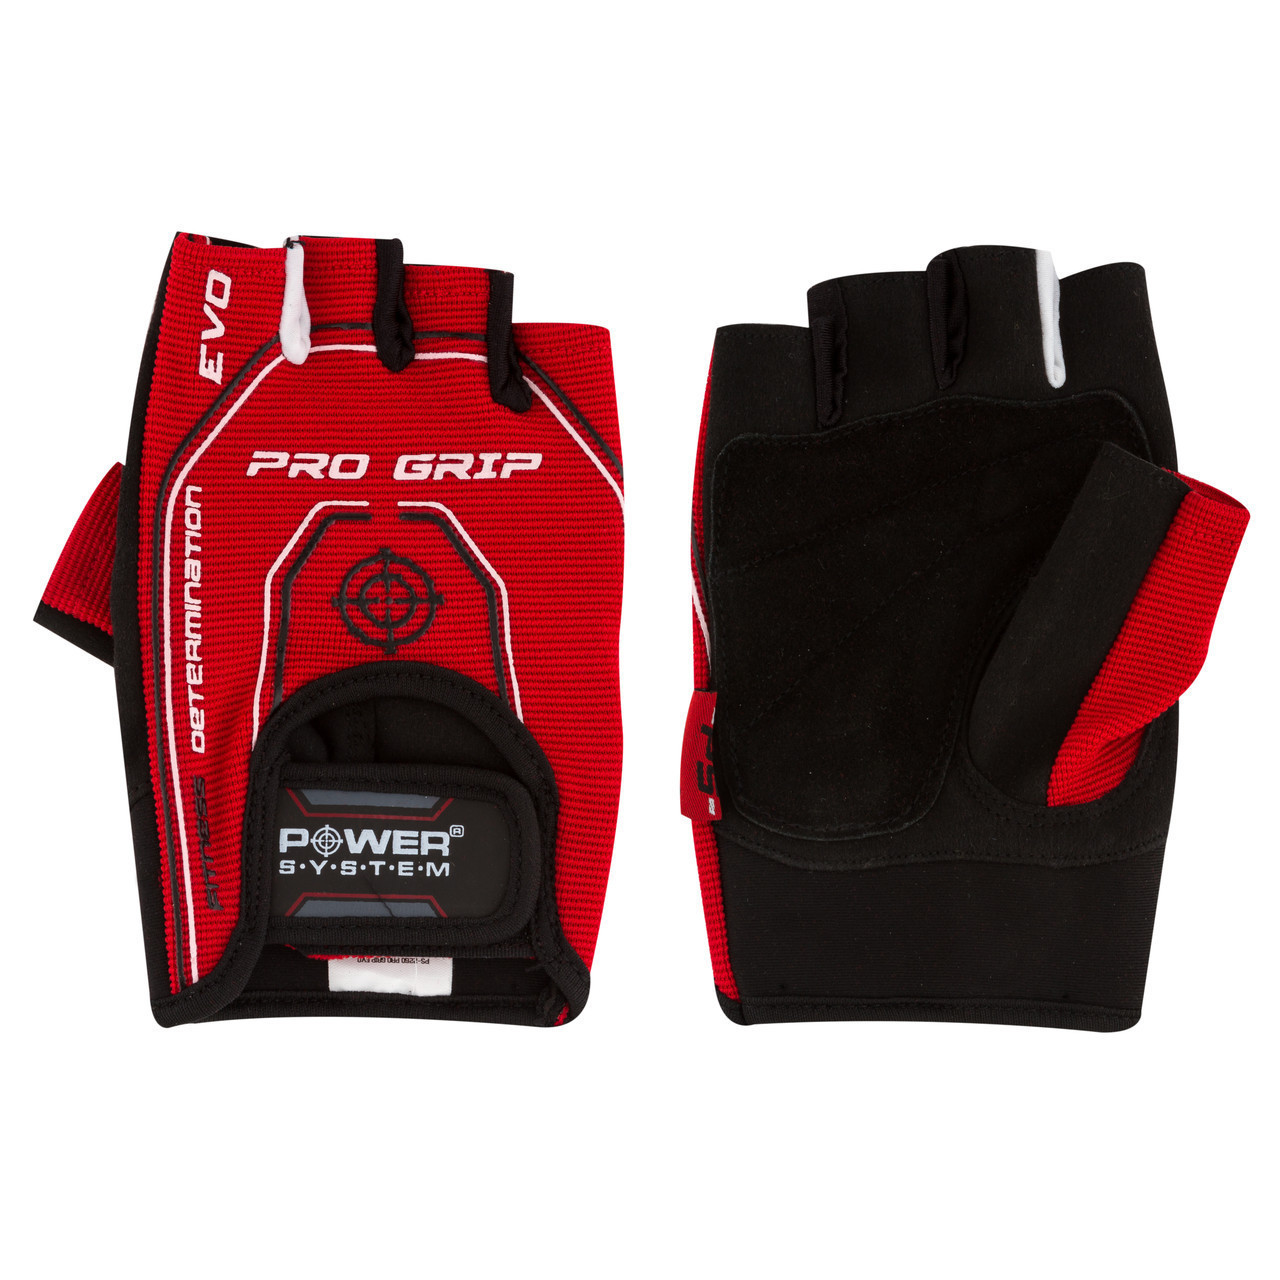 Перчатки для фитнеса и тяжелой атлетики Power System Pro Grip EVO PS-2250E M Red